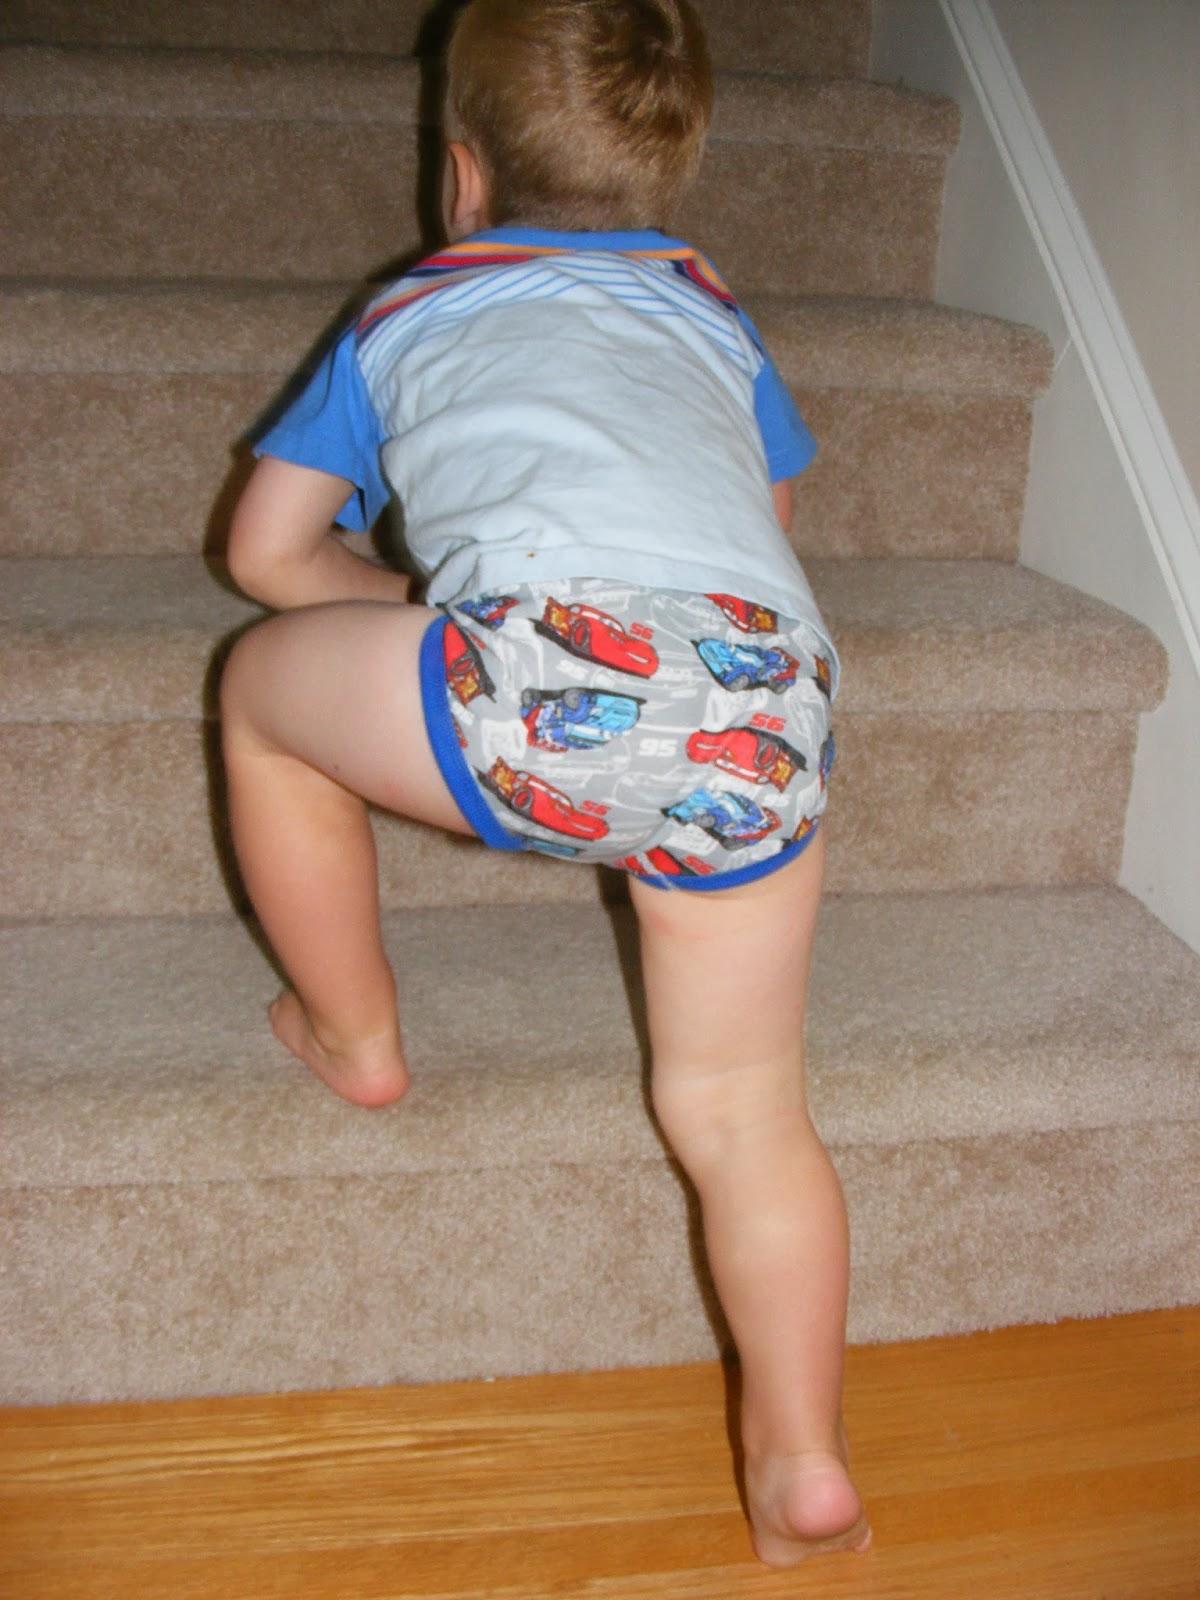 Kids Wearing Diapers Big kids still in diapers.